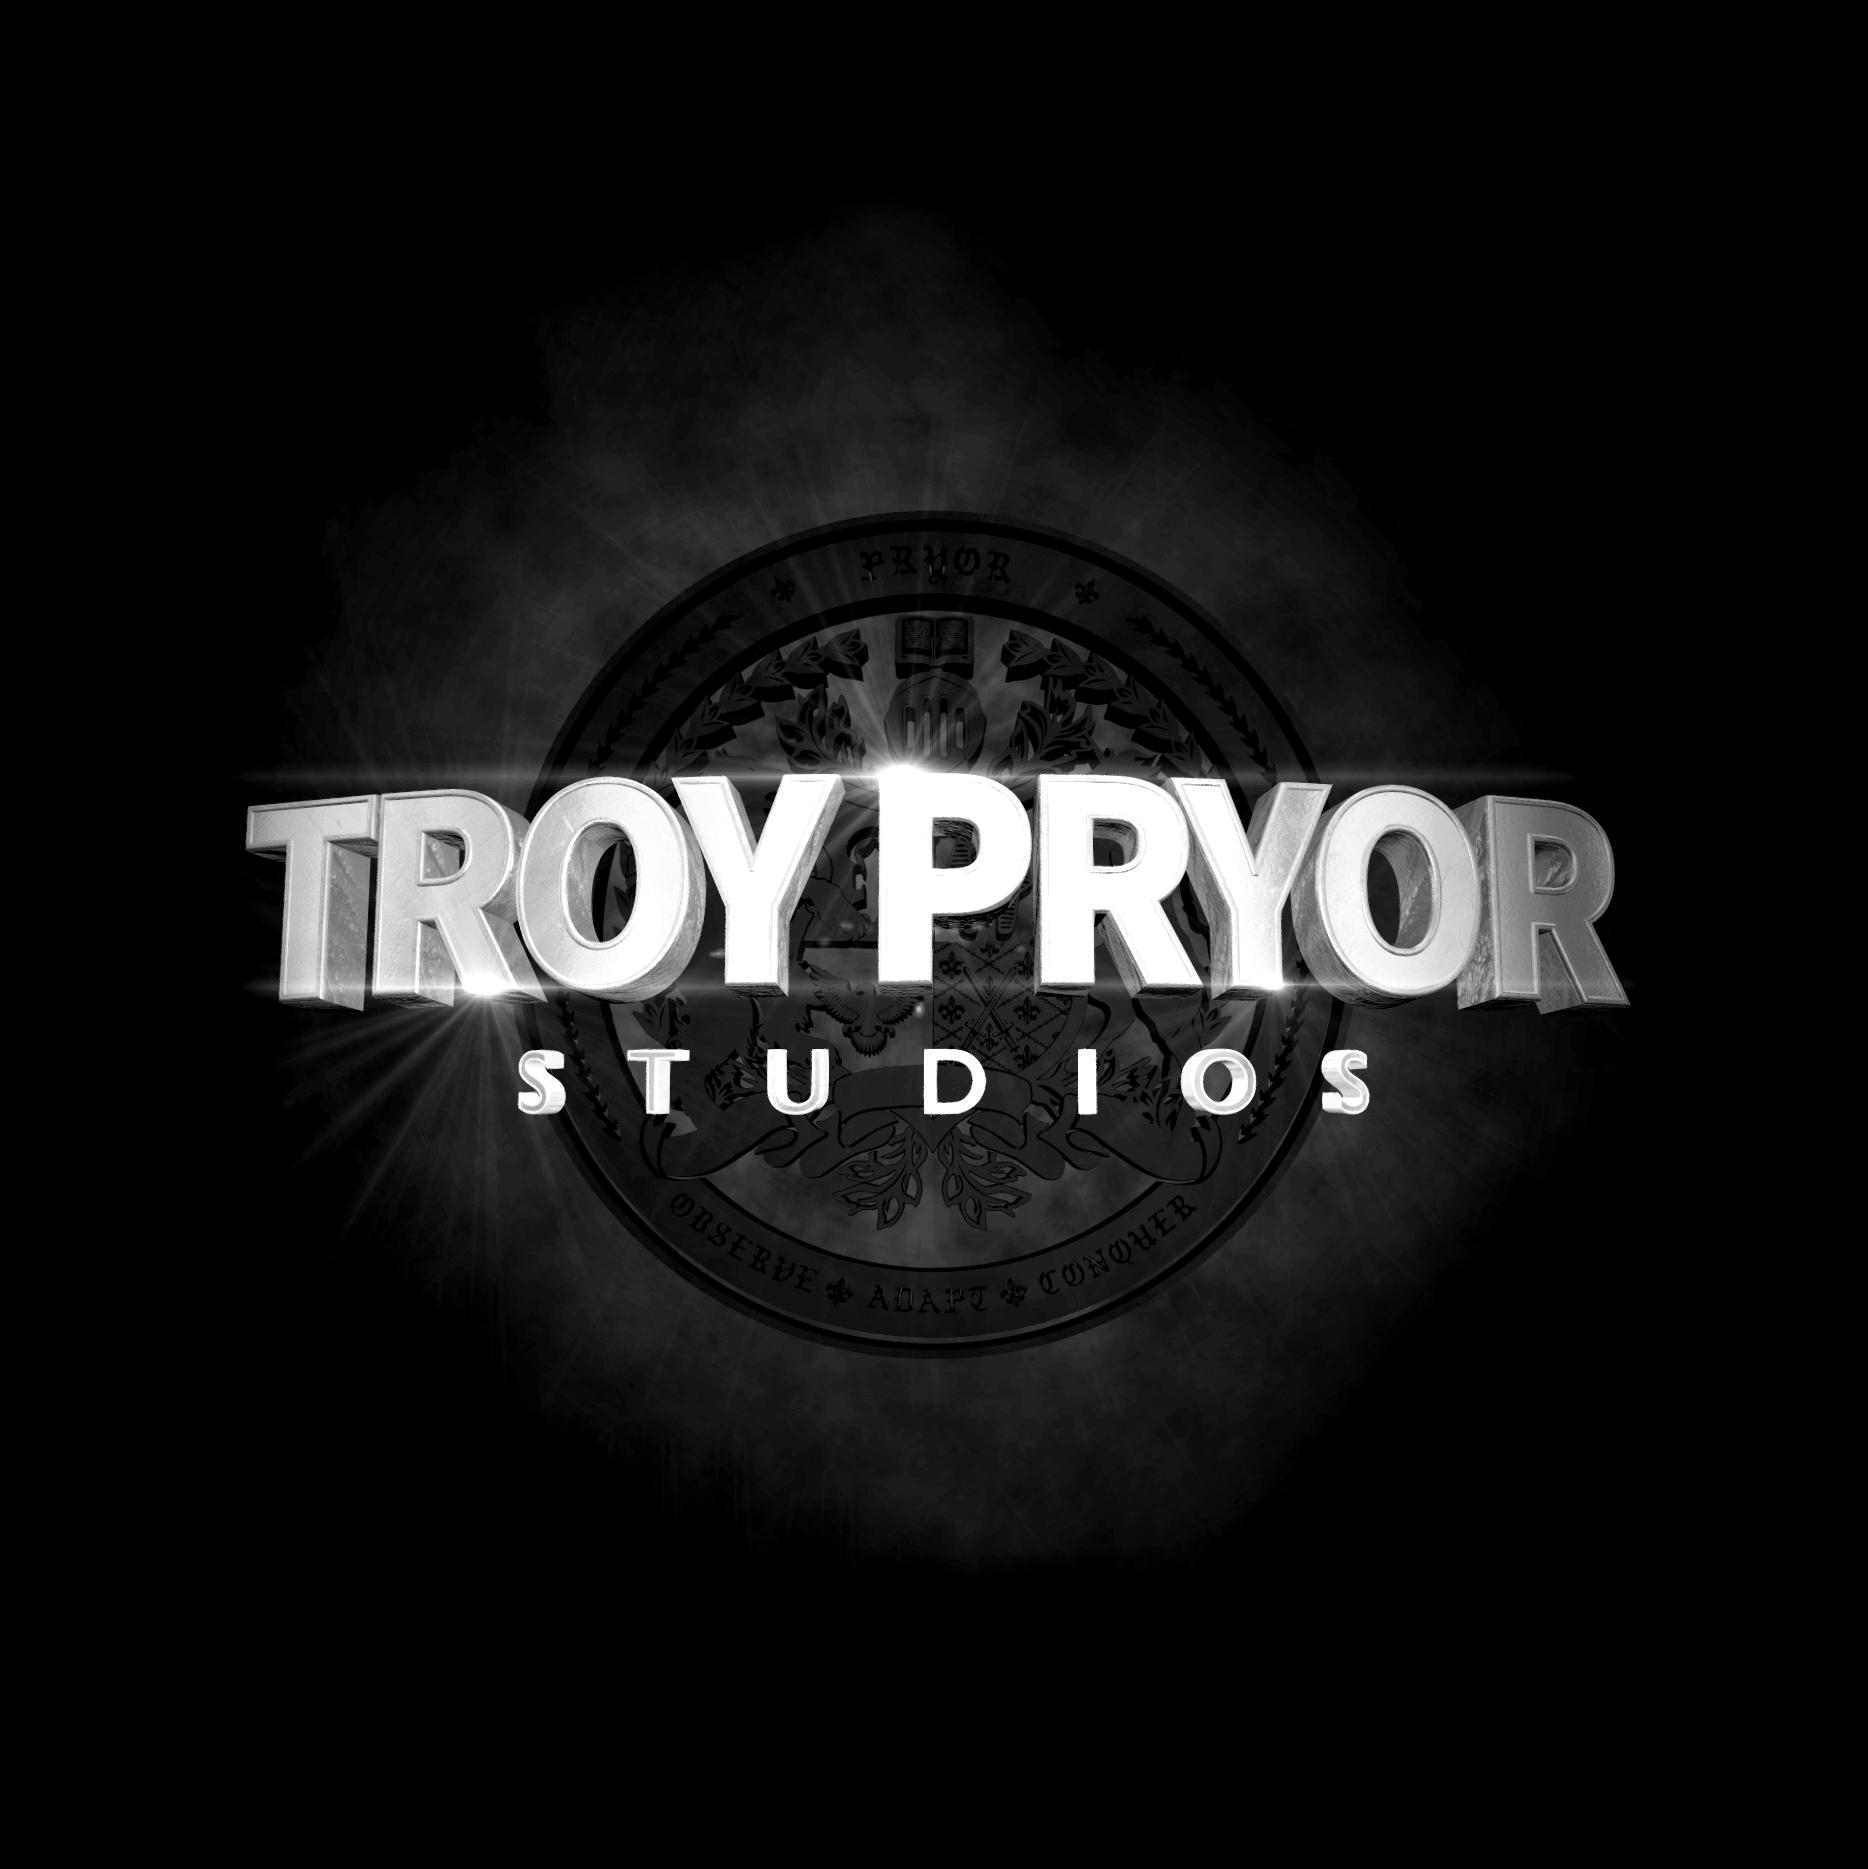 Troy+Pryor+Studios.jpg